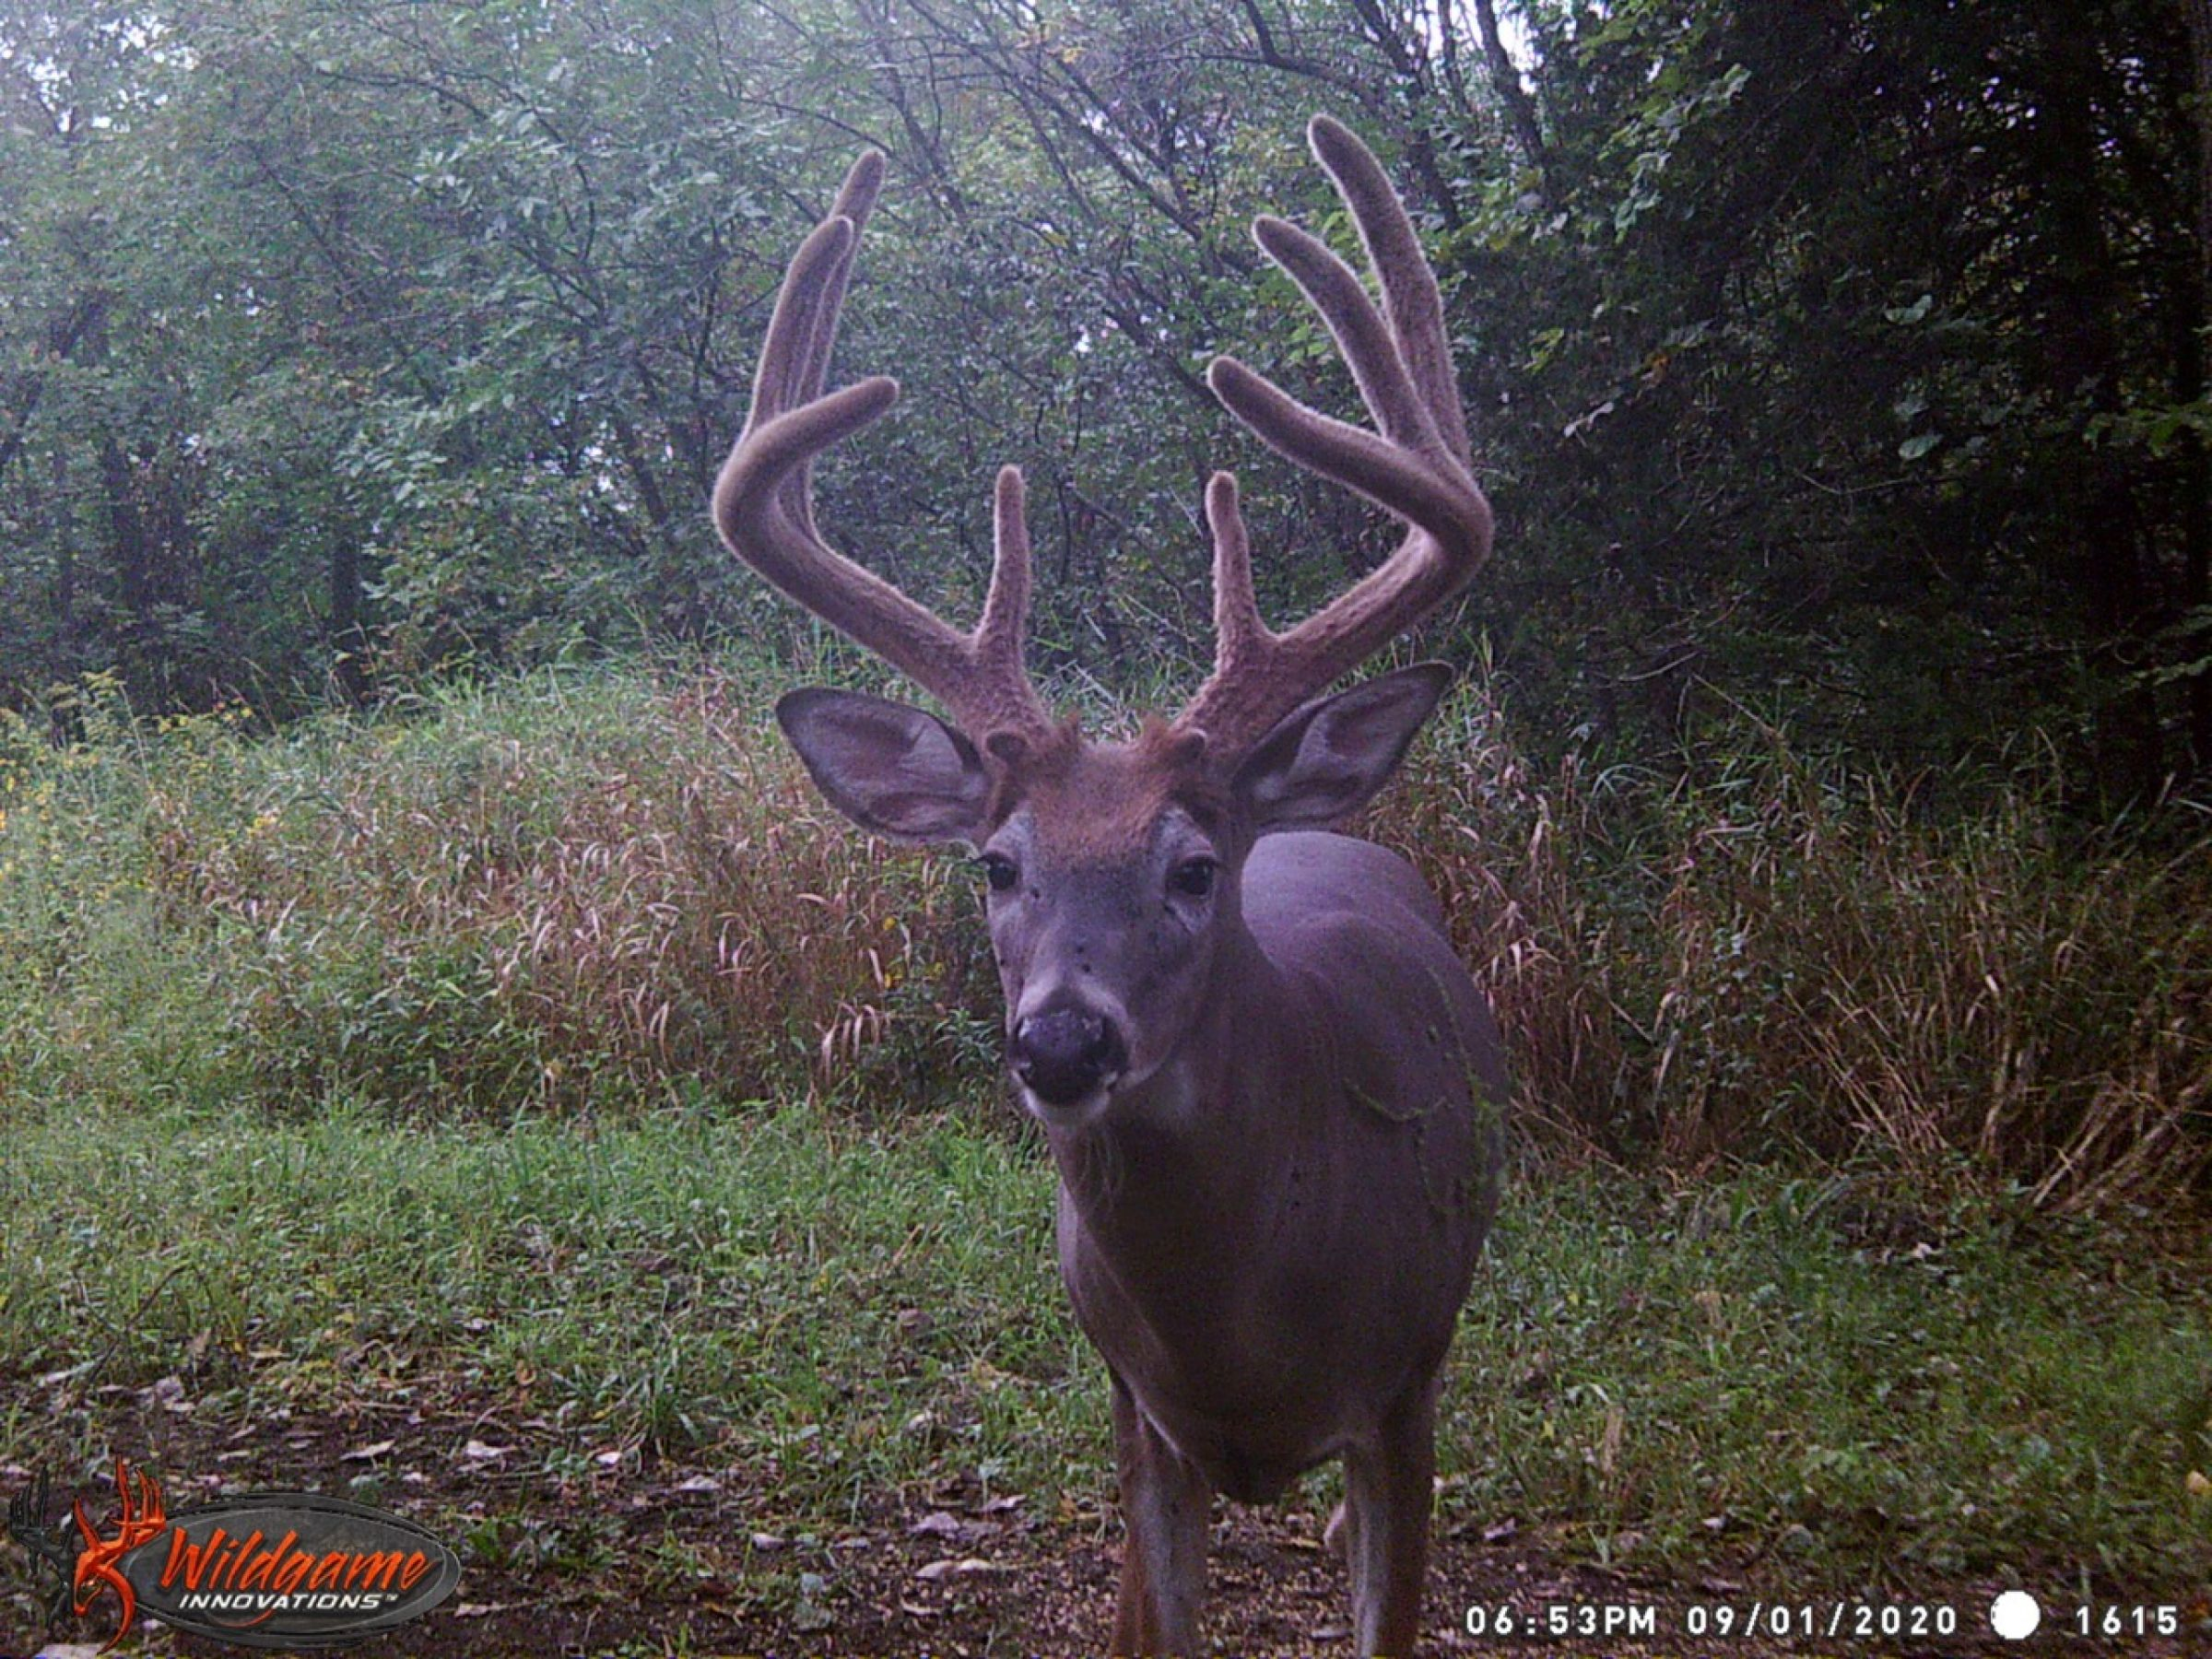 land-clarke-county-iowa-325-acres-listing-number-15416-2-2021-03-17-205902.jpeg